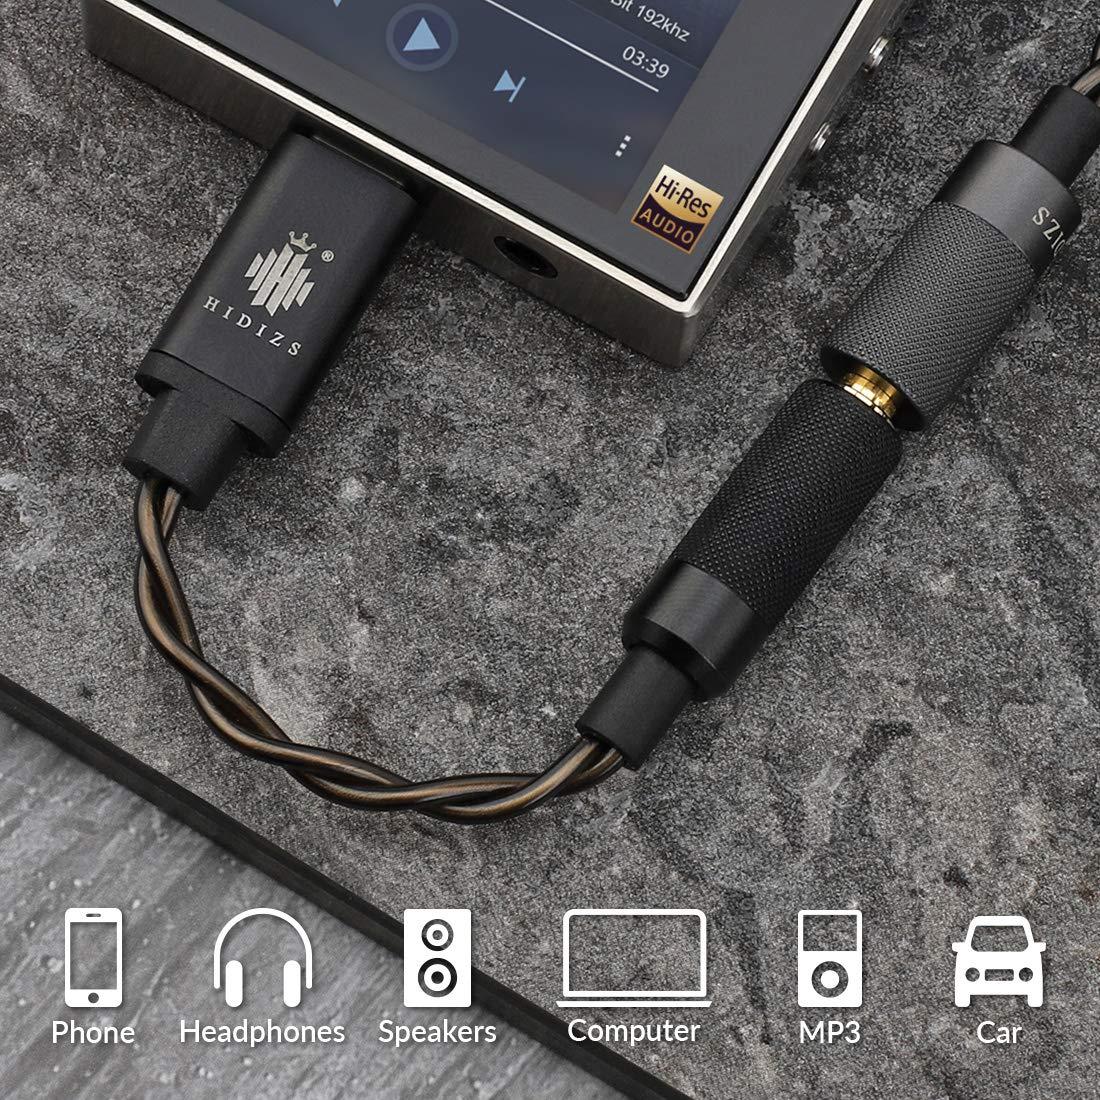 Windows10 HIDIZS S1 Tragbarer Kopfh/örer-Verst/ärker USB Typ C auf 3,5 mm Kopfh/örer-DAC-Kabel-Konverter f/ür MacOSX//Android